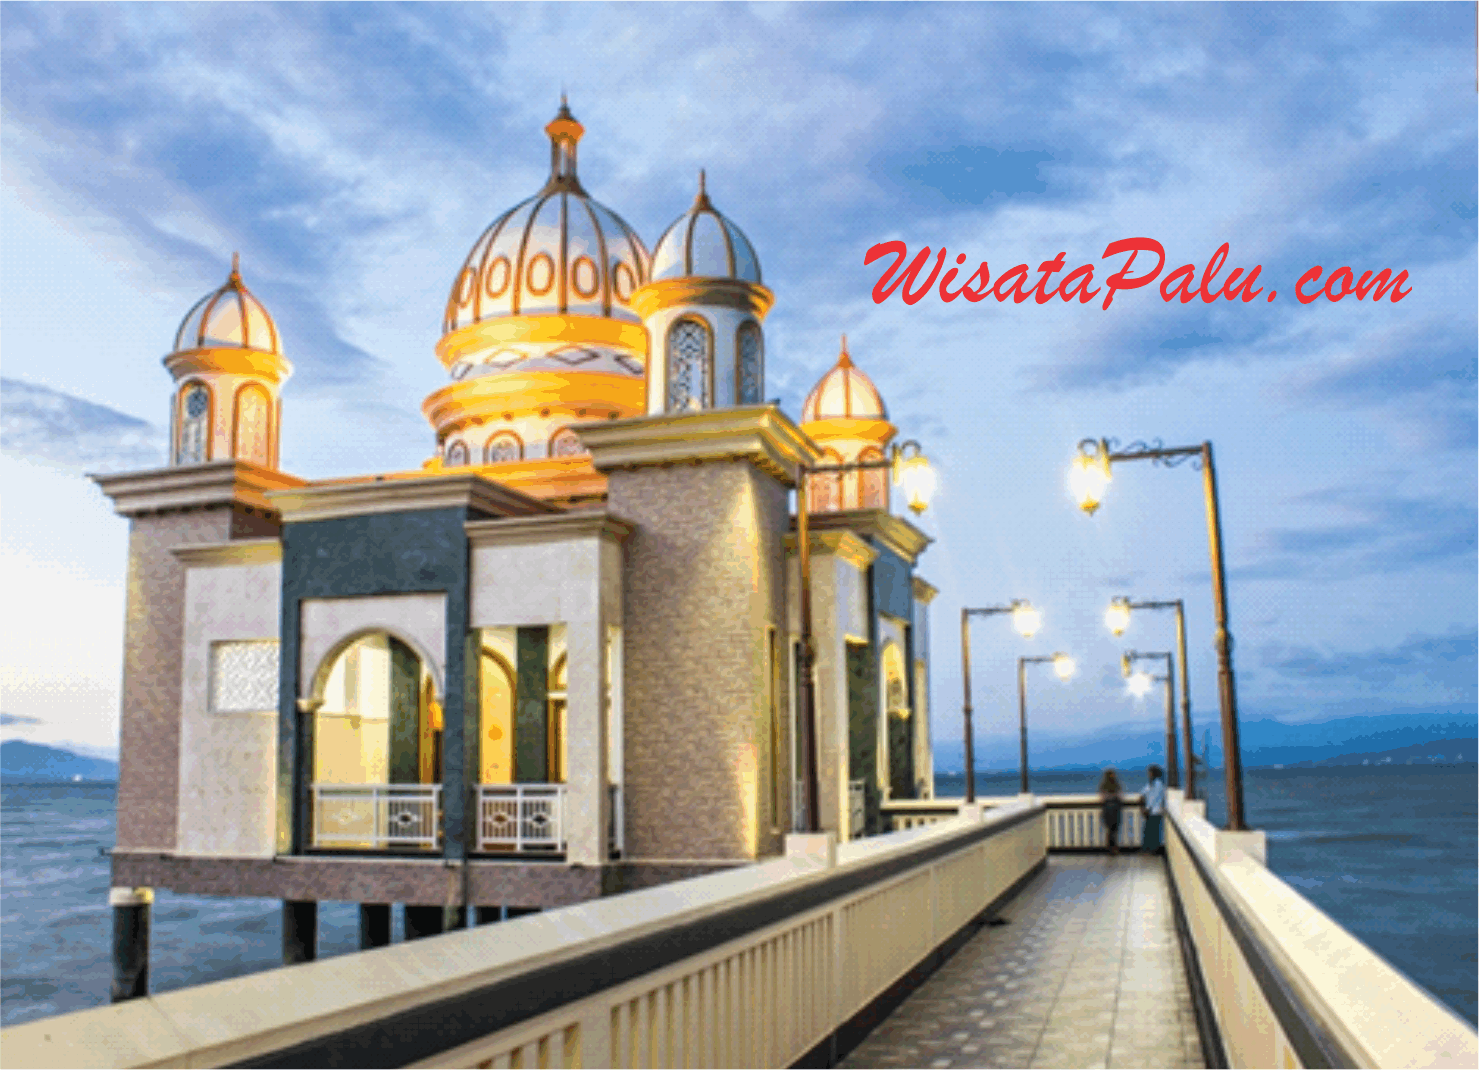 Wisata Religi Kota Palu Kubah Mesjid 7 Warna Jembatan Iv